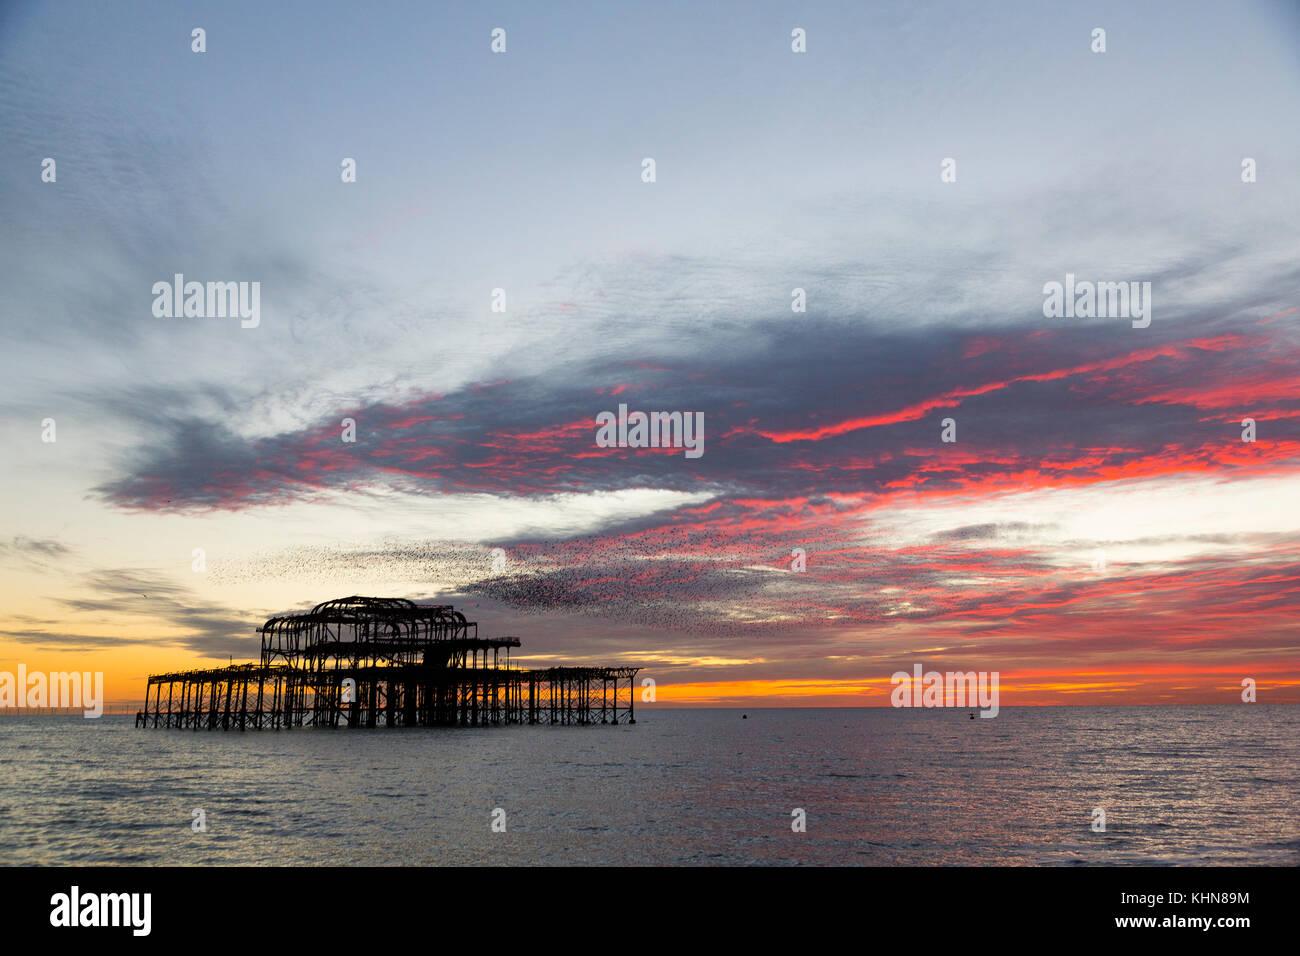 Brighton, UK. Starling murmurations at sunset over Brighton's derelict west pier. Stock Photo